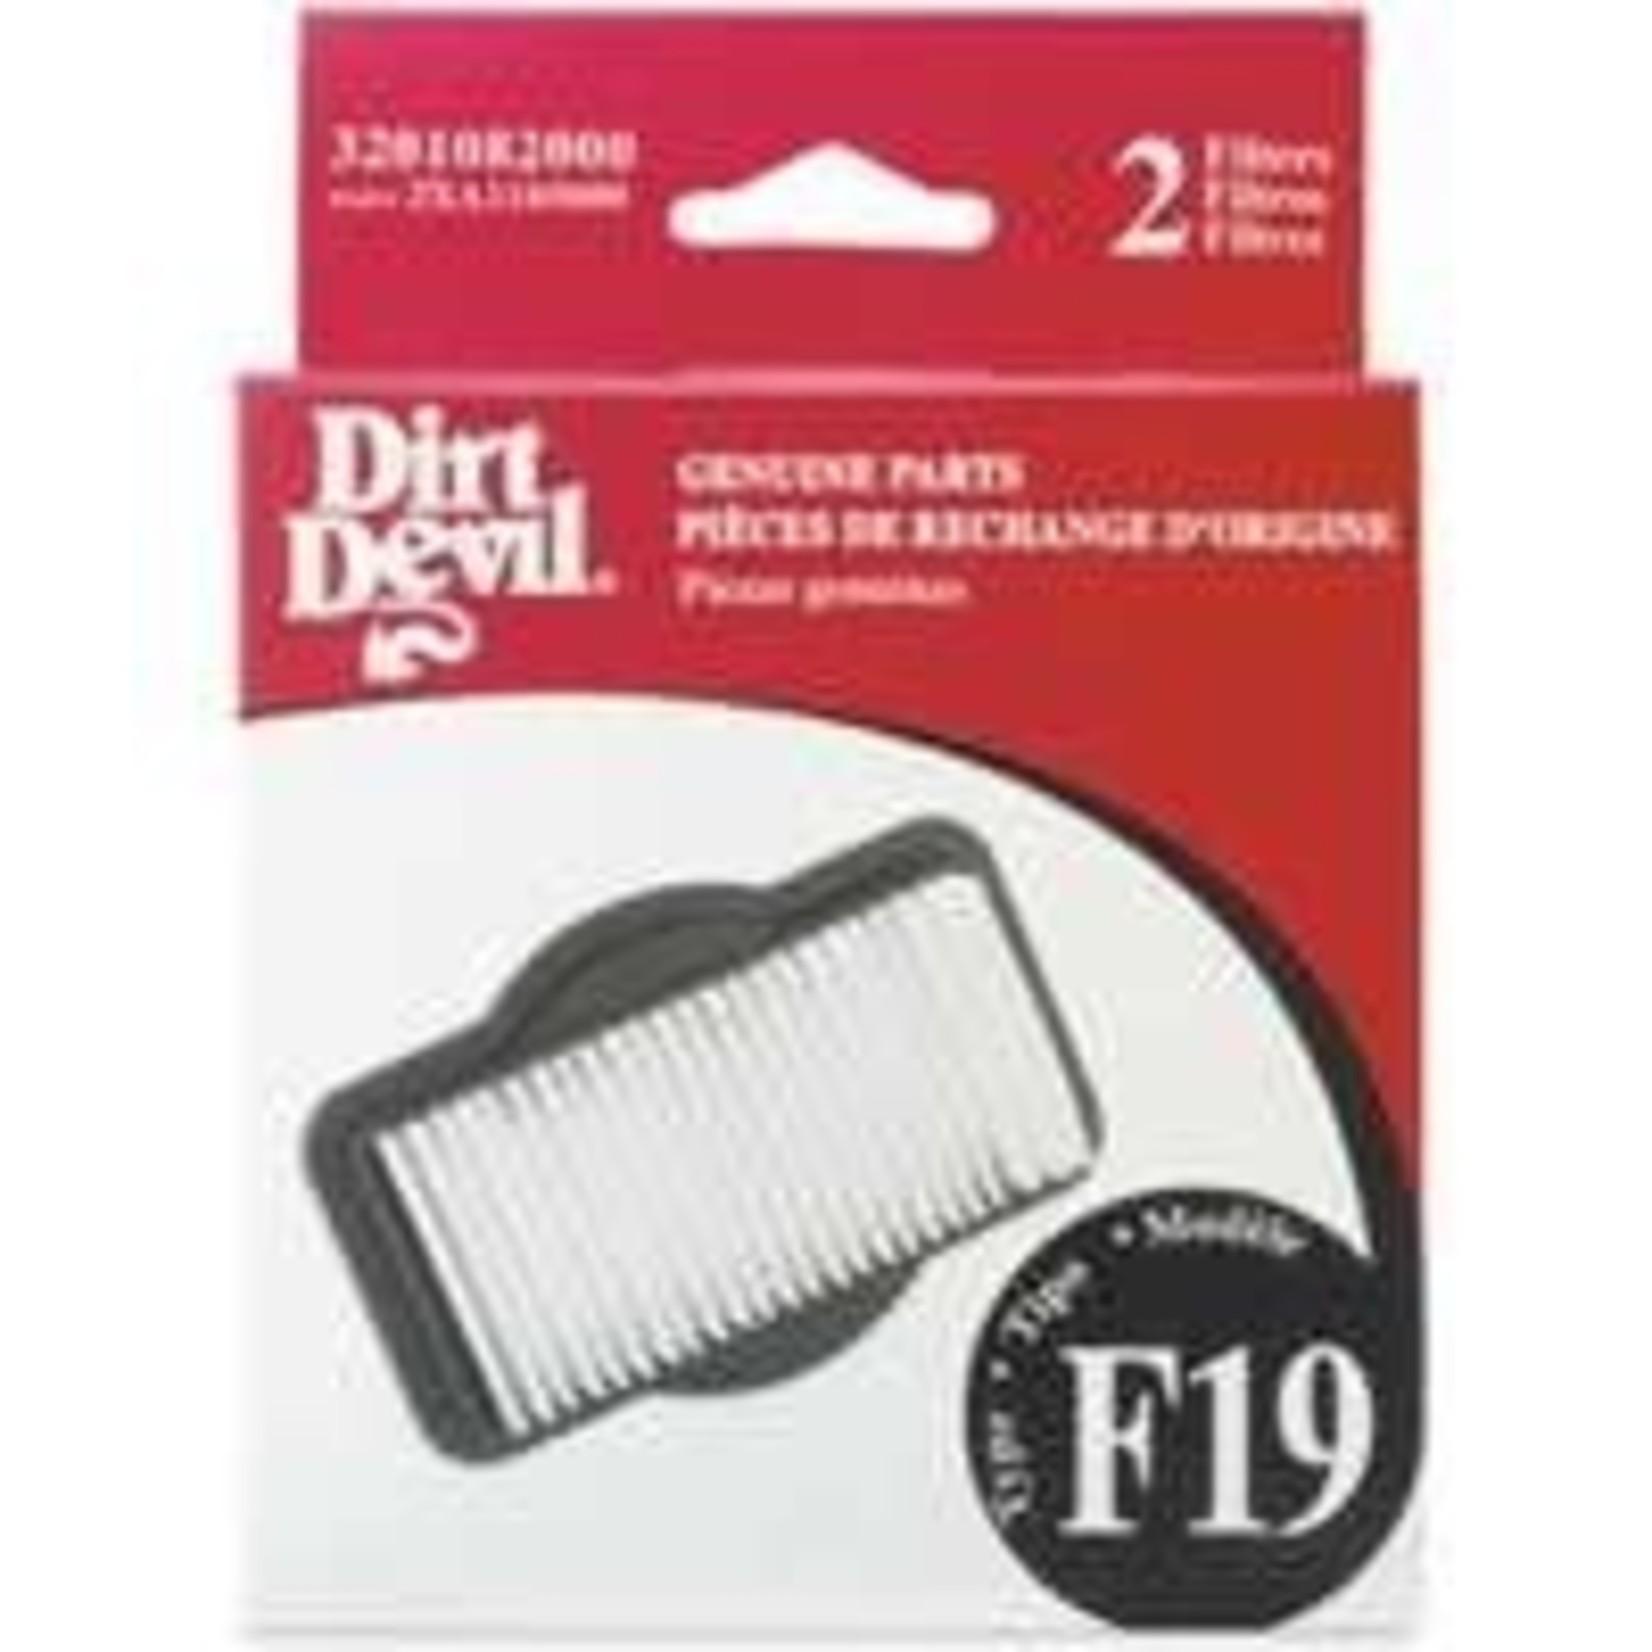 Dirt Devil Dirt Devil Cordless BroomVac Filter (2pk)